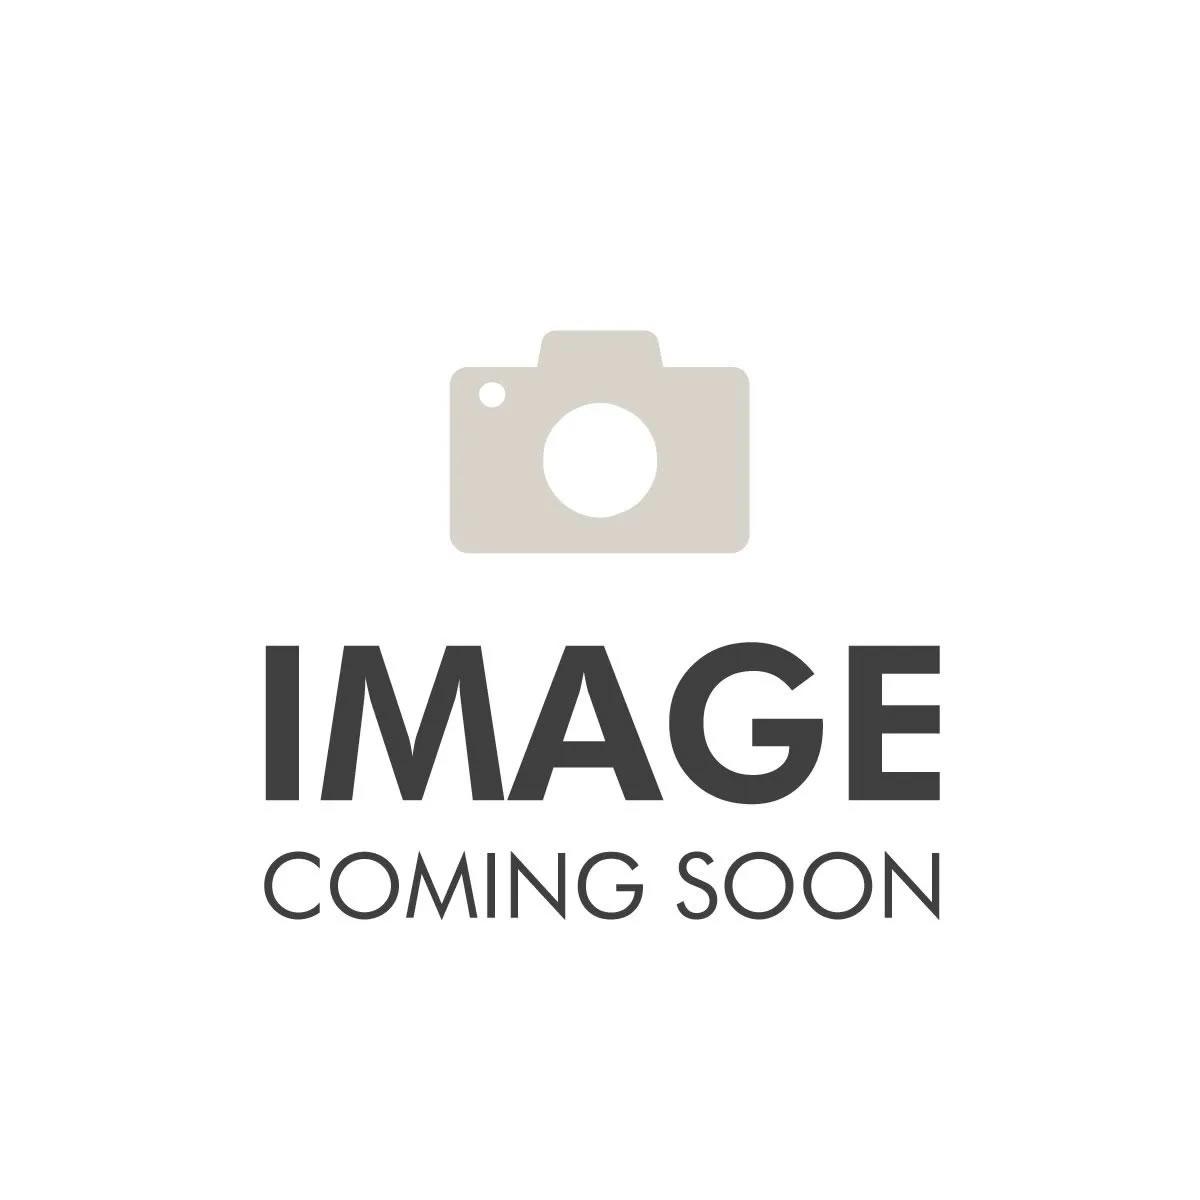 Bearing Kit, for 1 Piece, AMC 20; 76-86 Jeep CJ Models